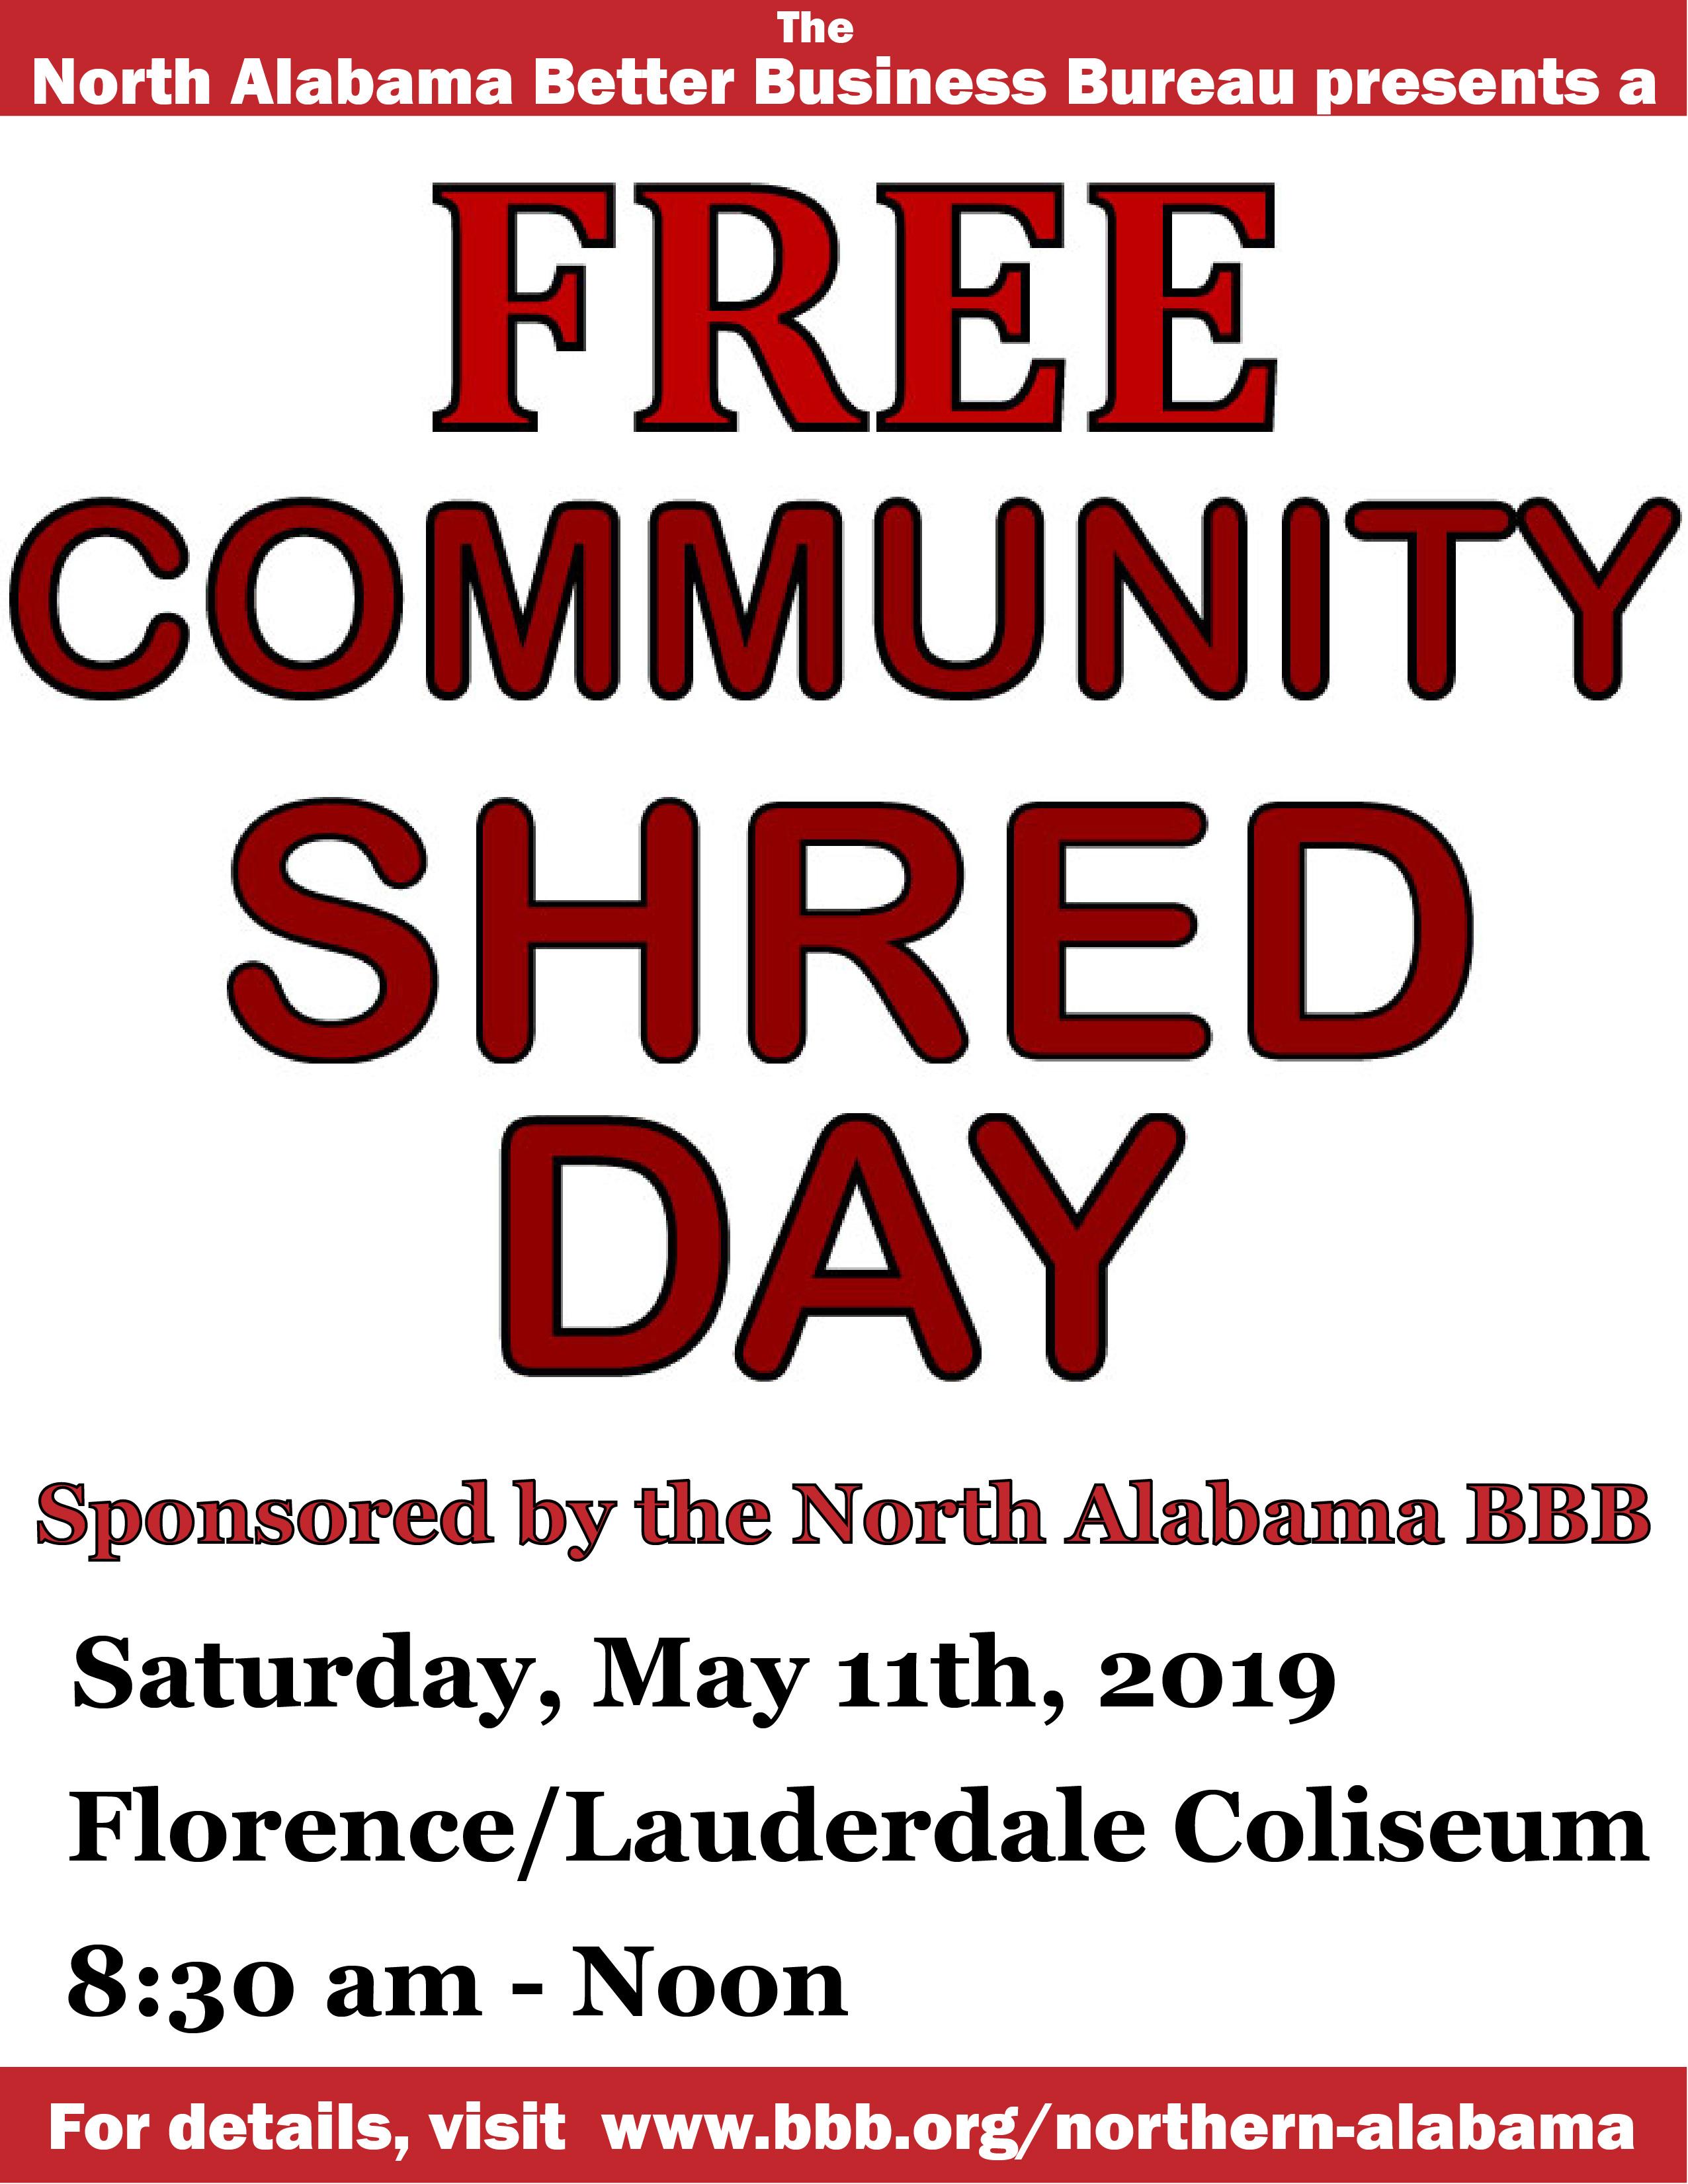 Free Community Shred Day - TVA Community Credit Union